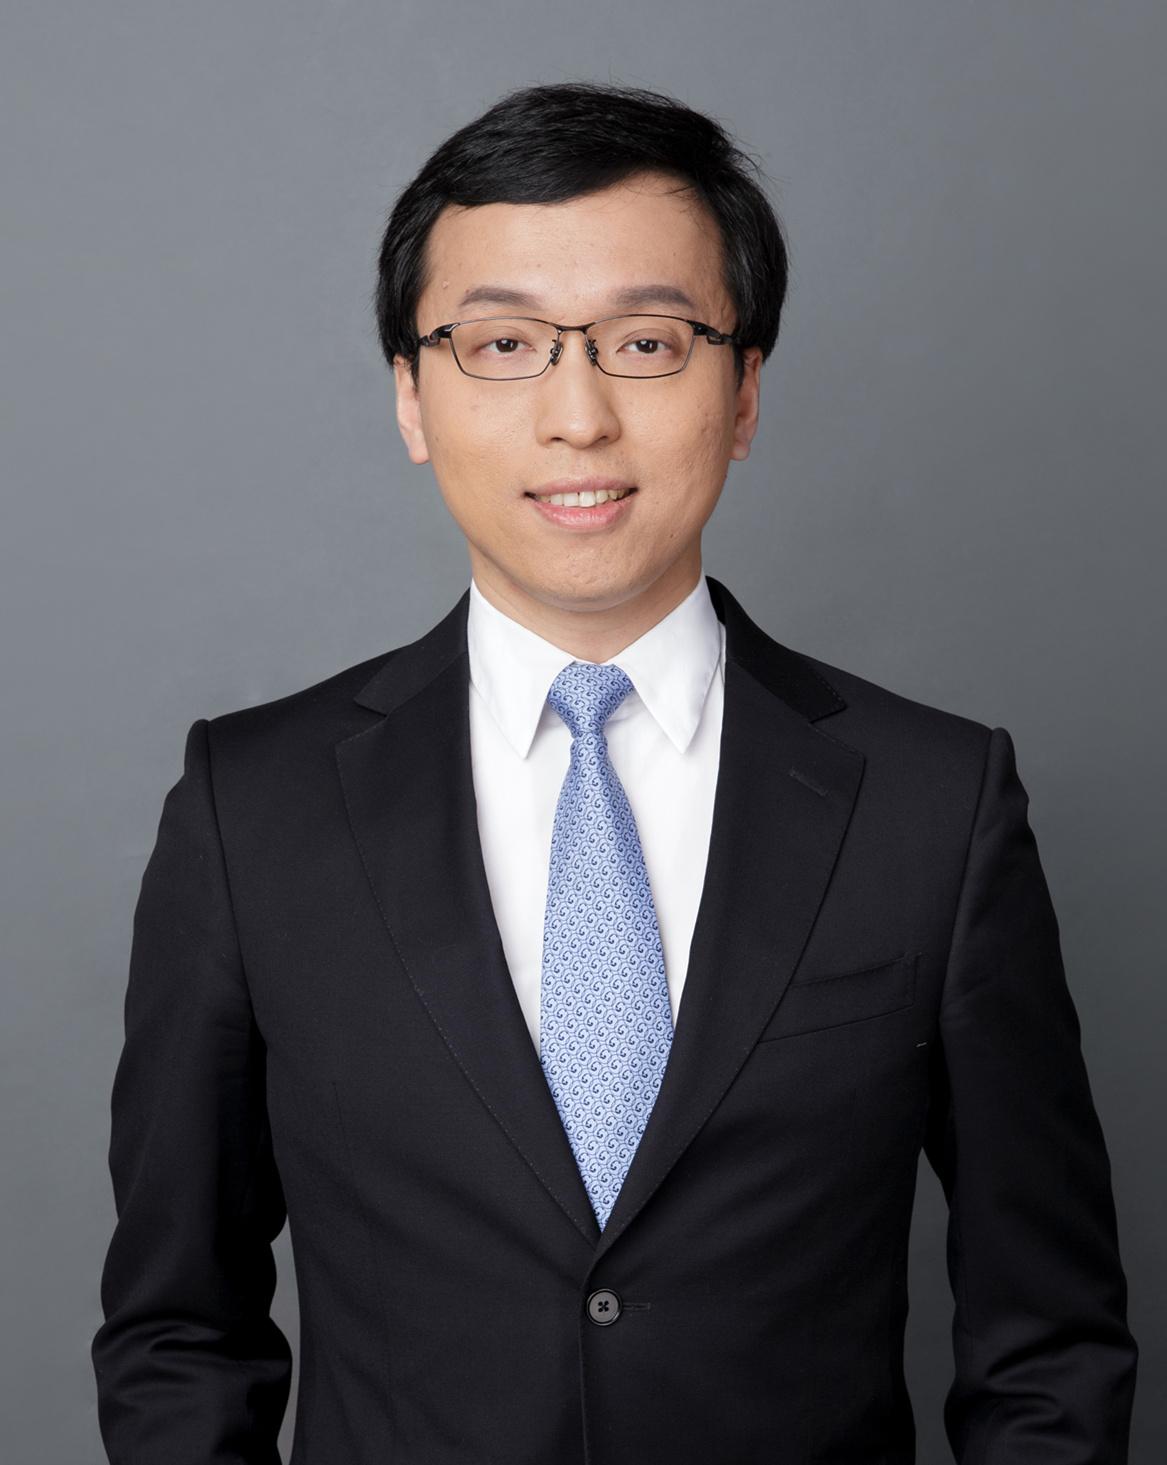 DAI Wenyuan